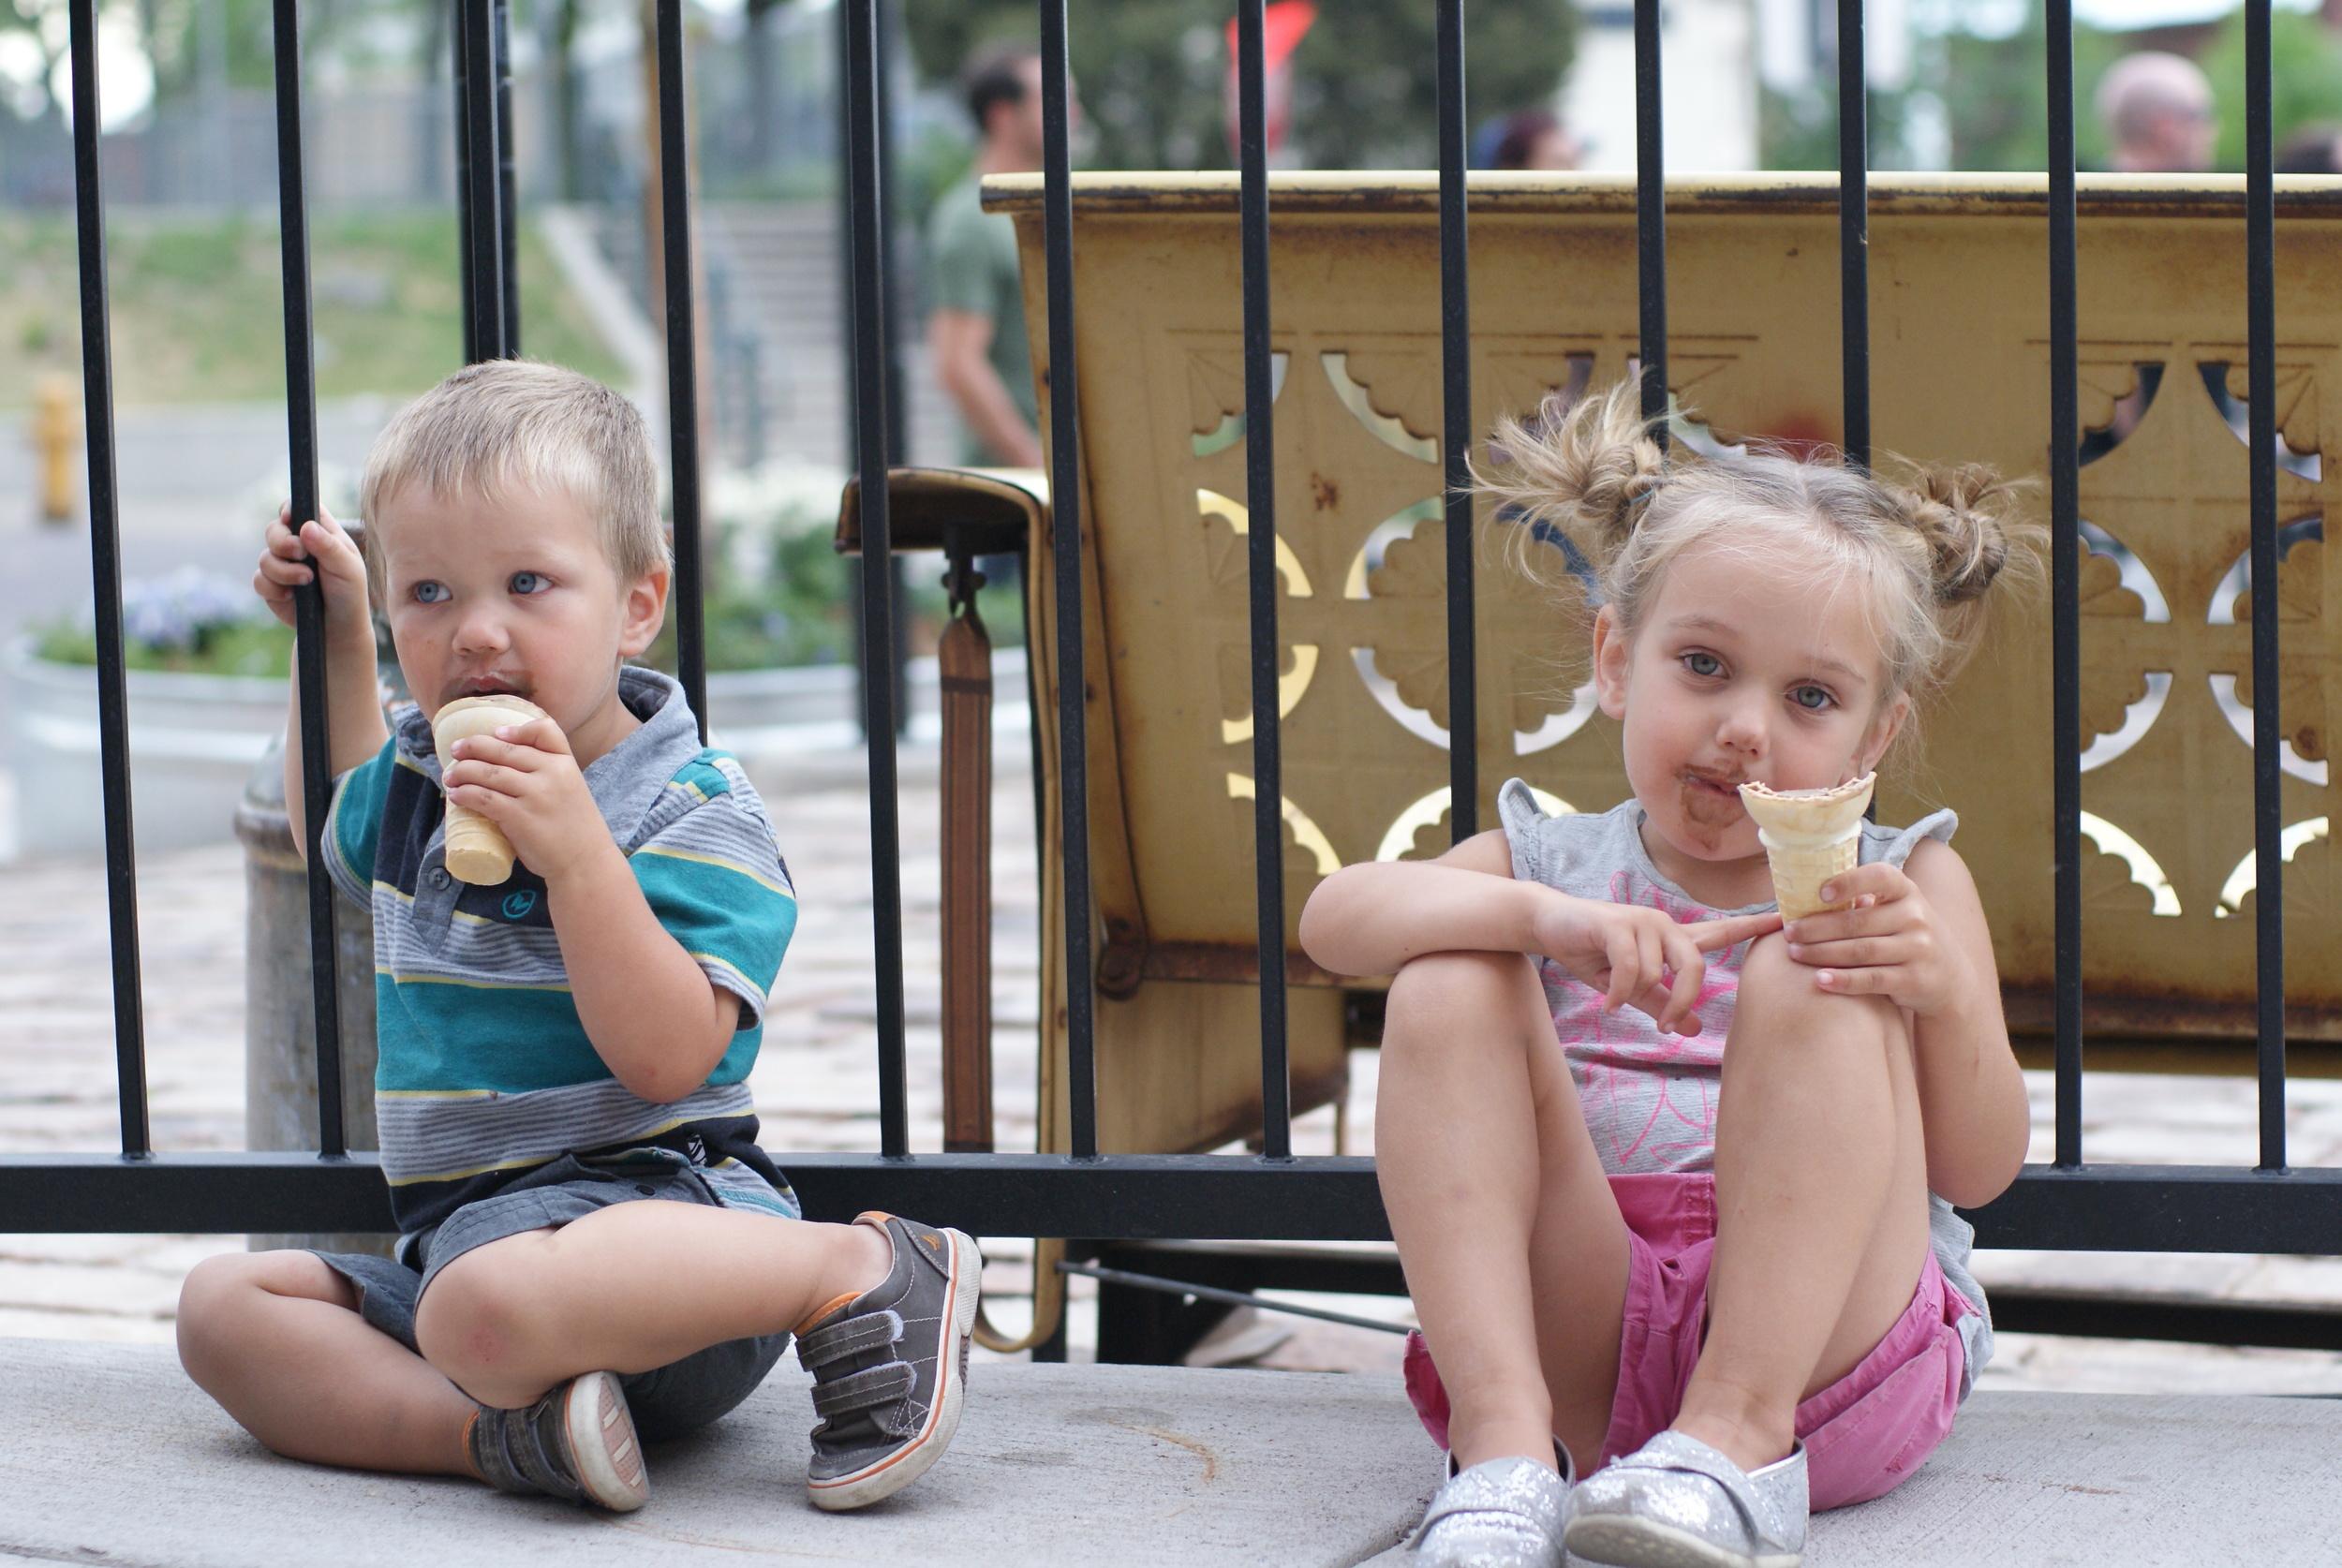 Evidence of the ice cream.